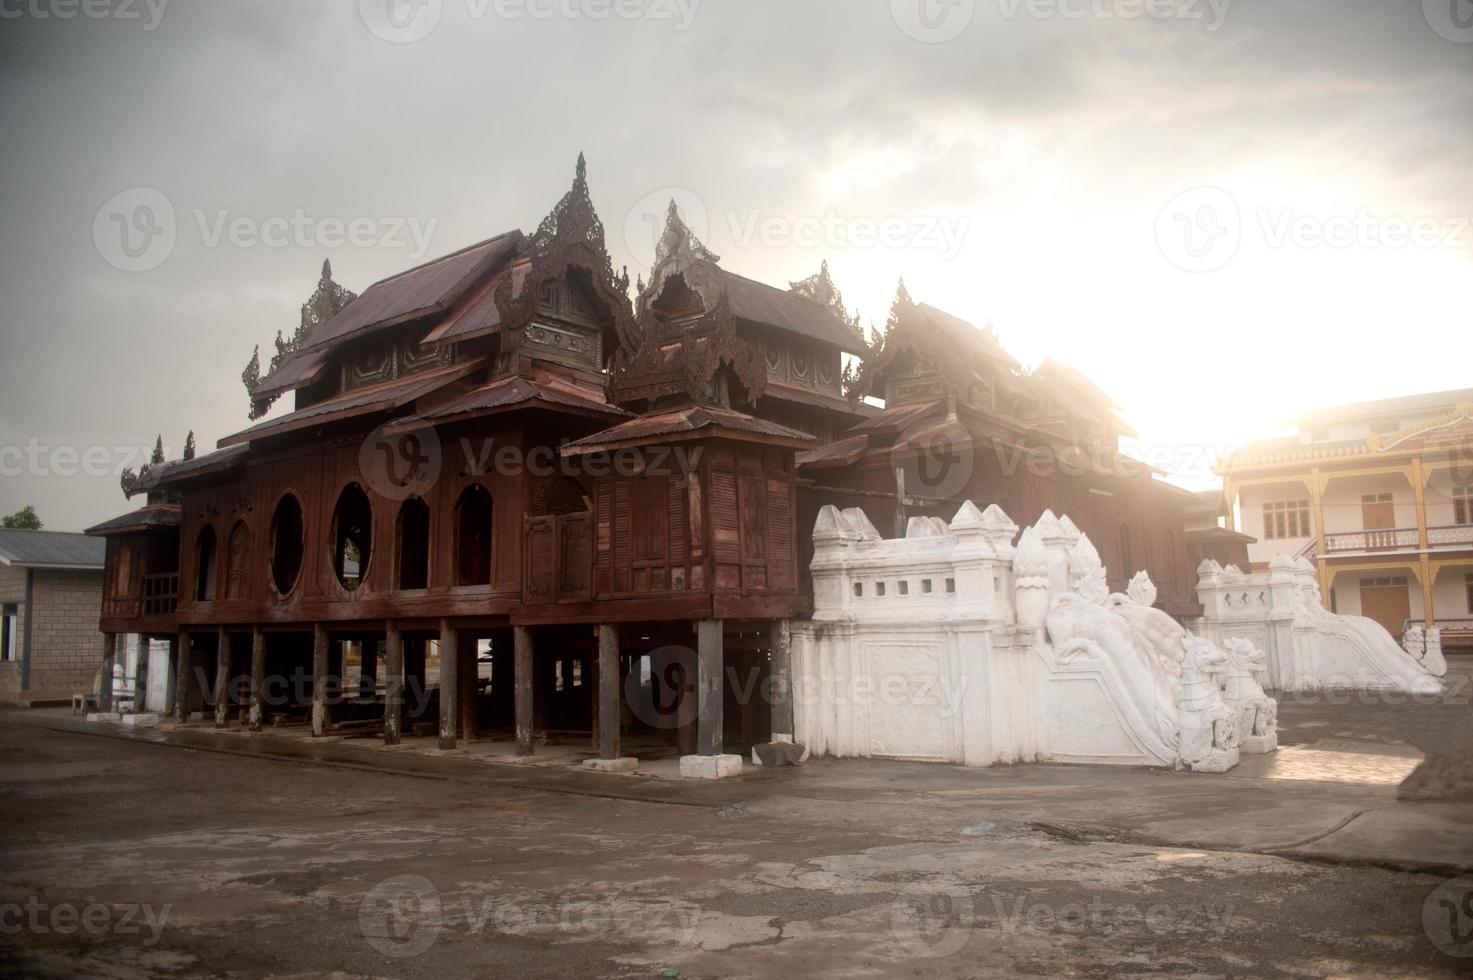 église en bois du temple nyan shwe kgua au myanmar. photo